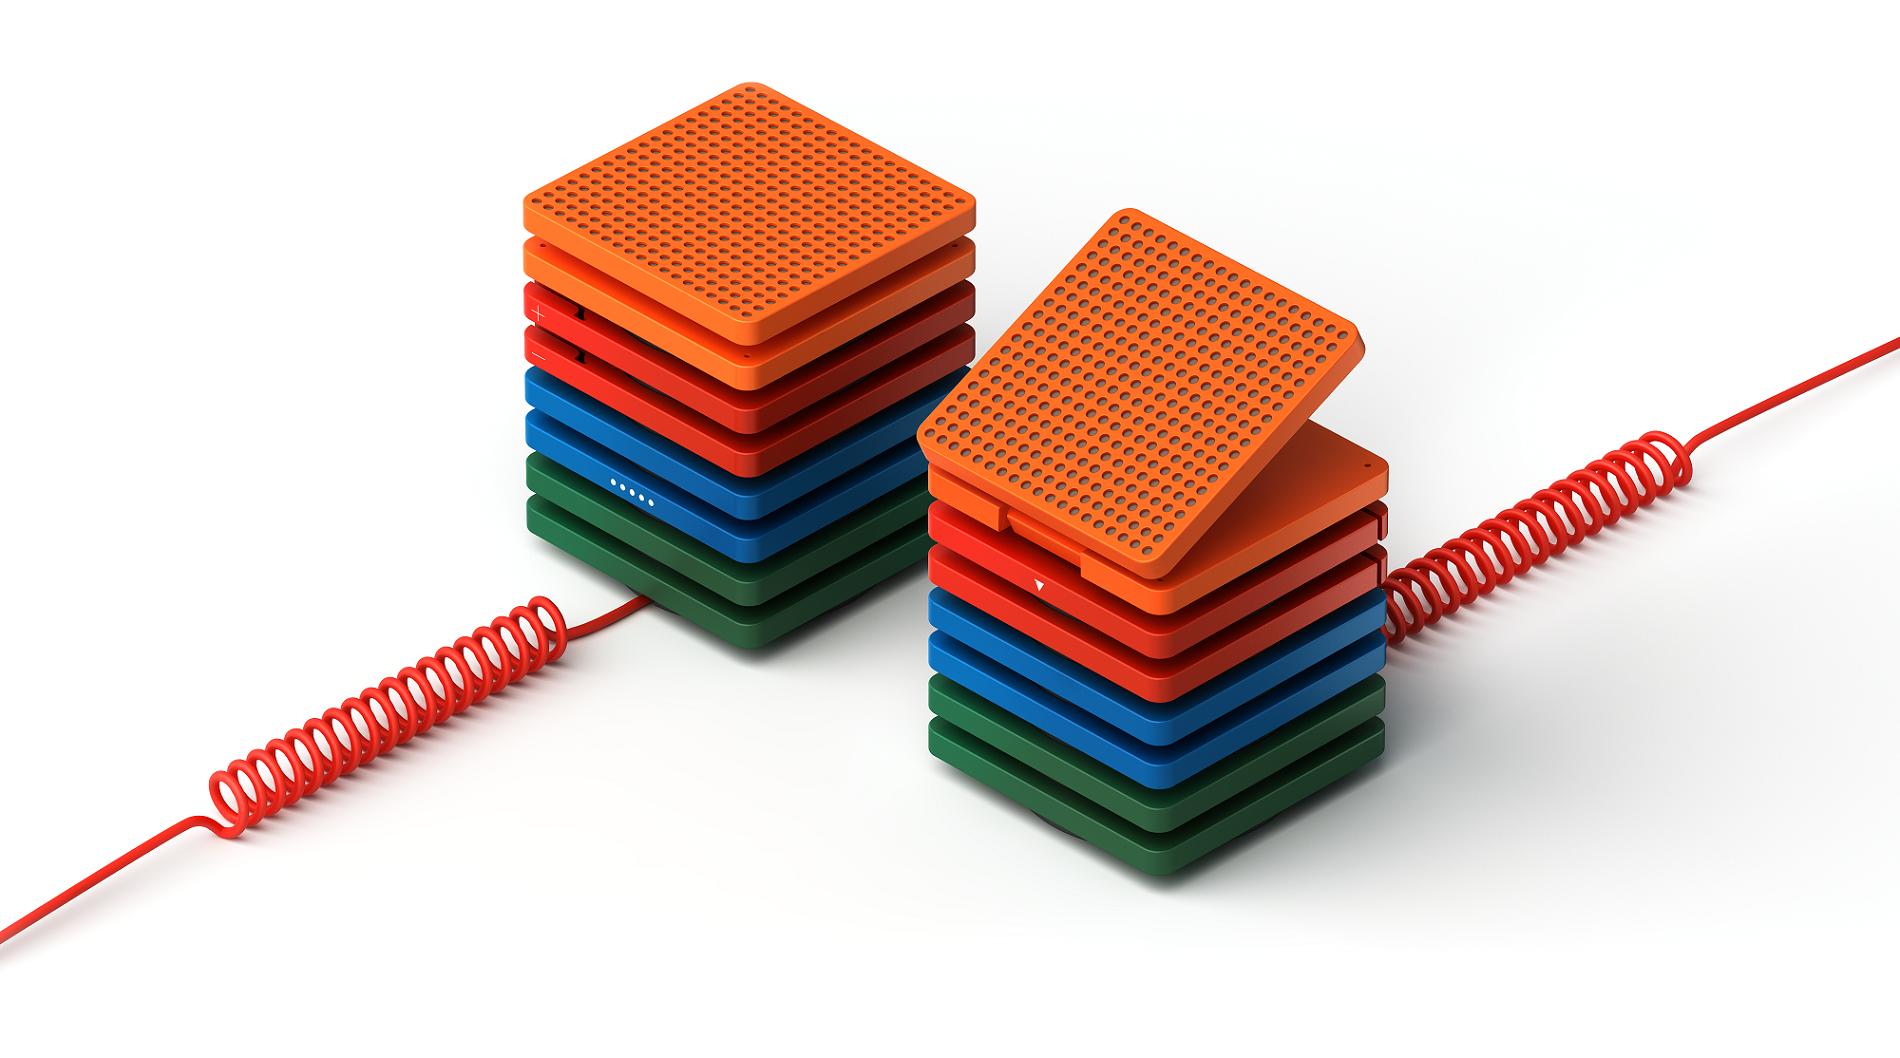 baidu-smart-speaker